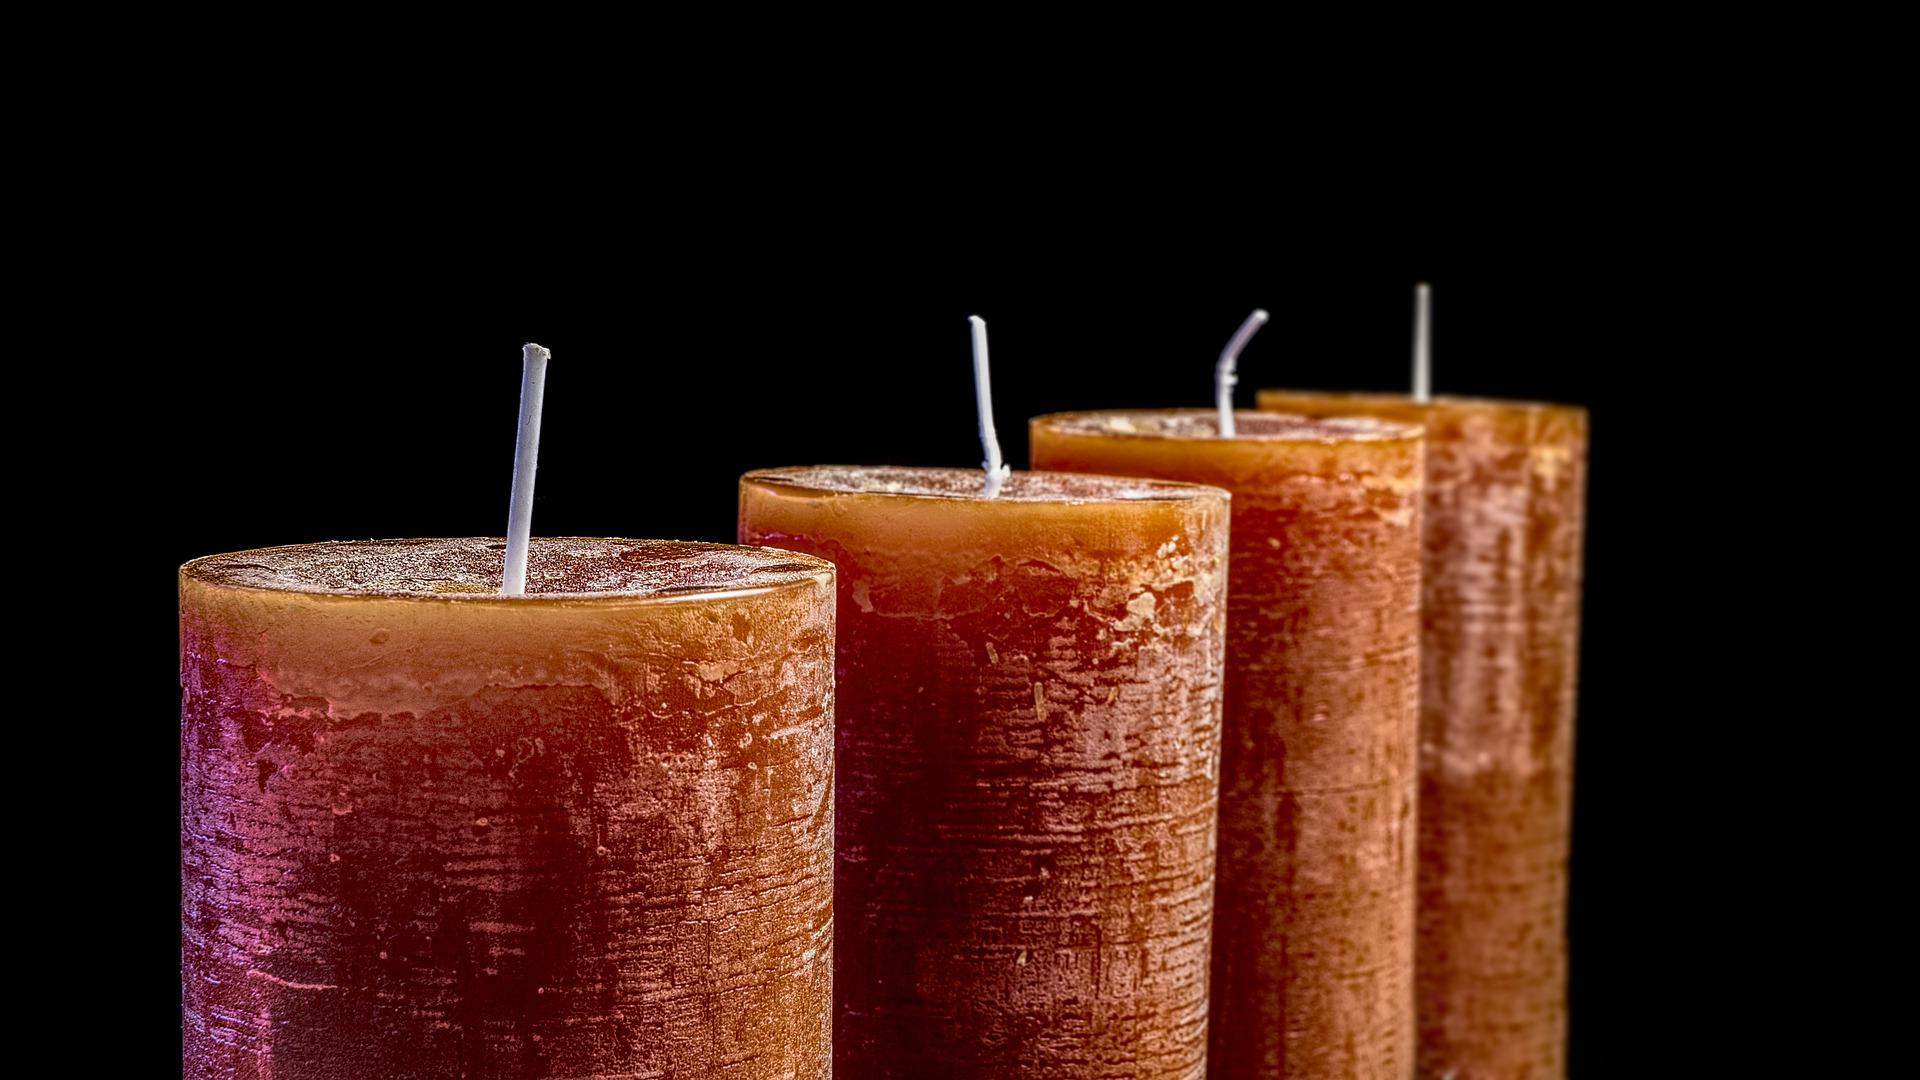 candles-2993936_1920.jpg